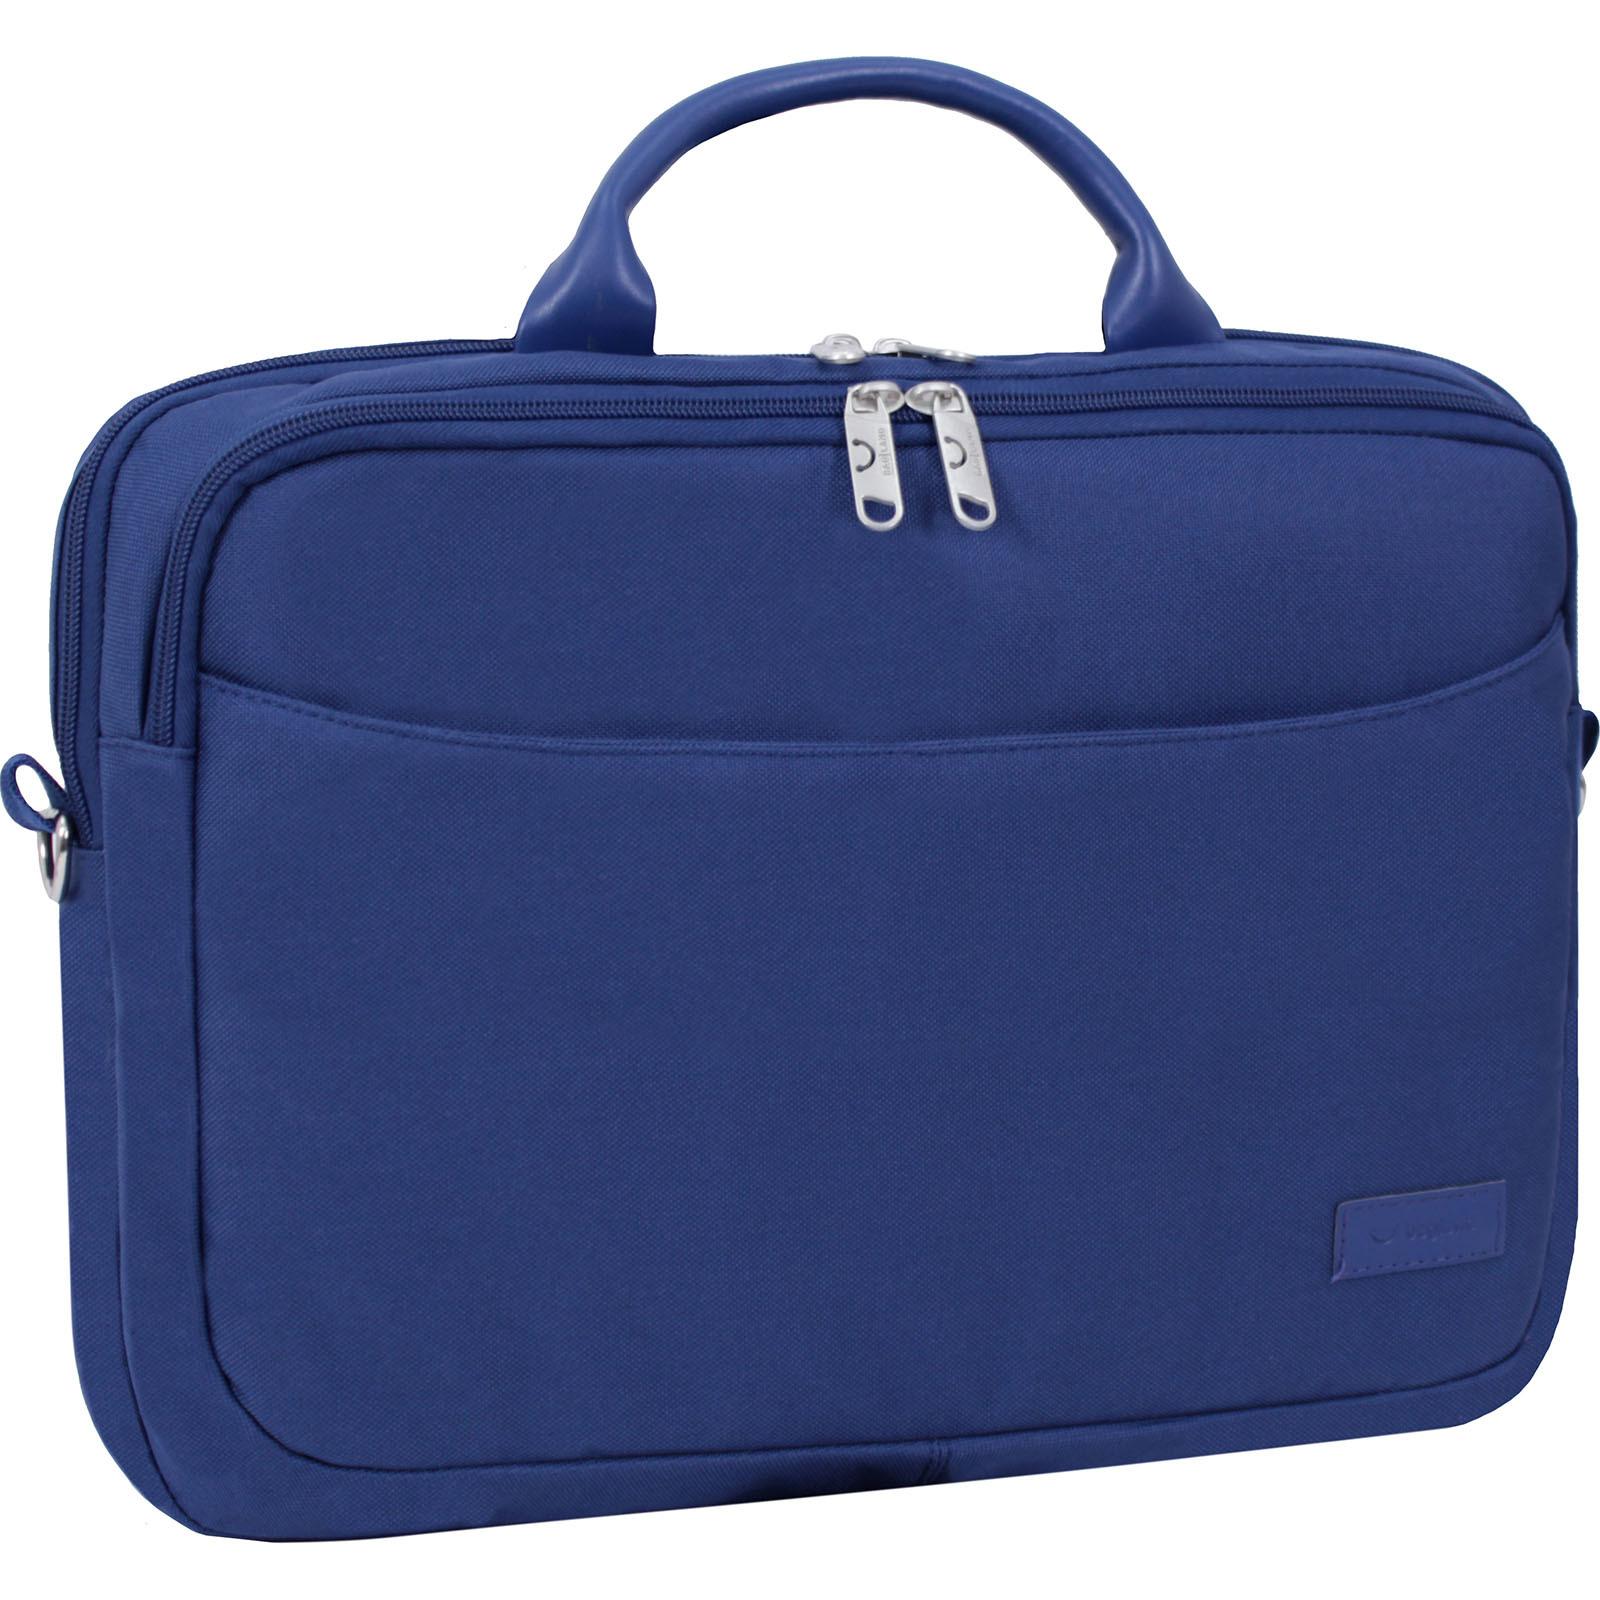 Сумки для ноутбука Сумка для ноутбука Bagland Fremont 11 л. синий (0042766) IMG_3120.JPG